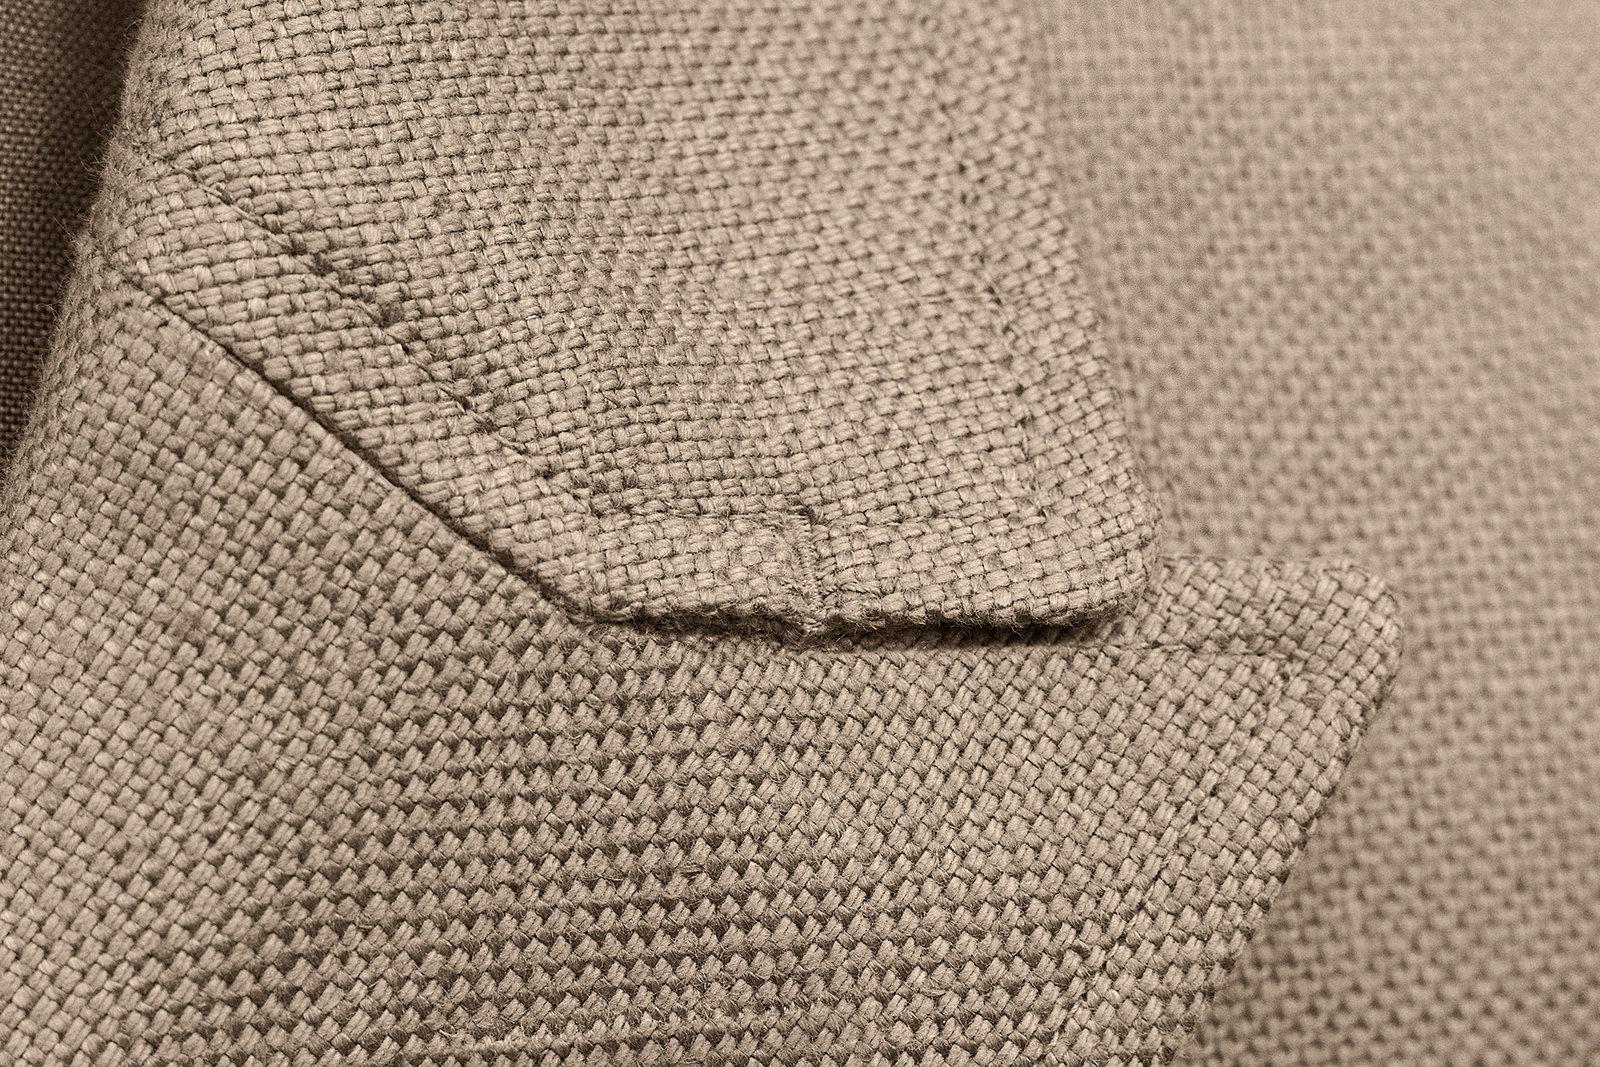 shopcoat-cotton-linen-hopsack-malt-4@2x.jpg